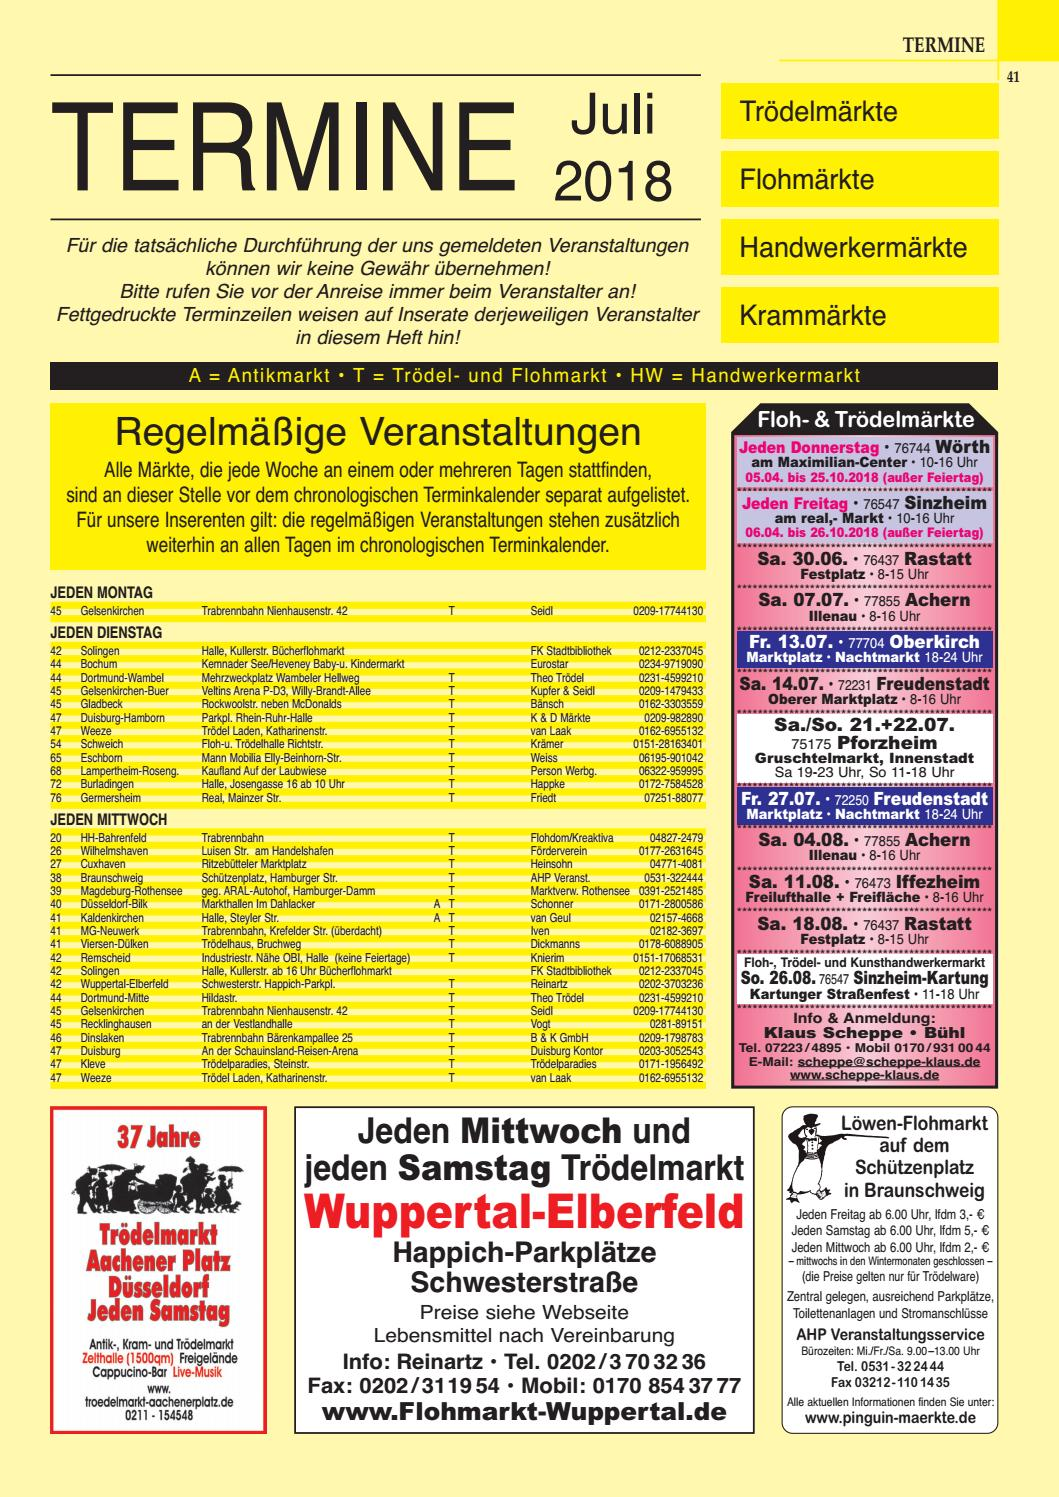 Termine Troedelmaerkte 0718 By Gemi Verlags Gmbh Issuu